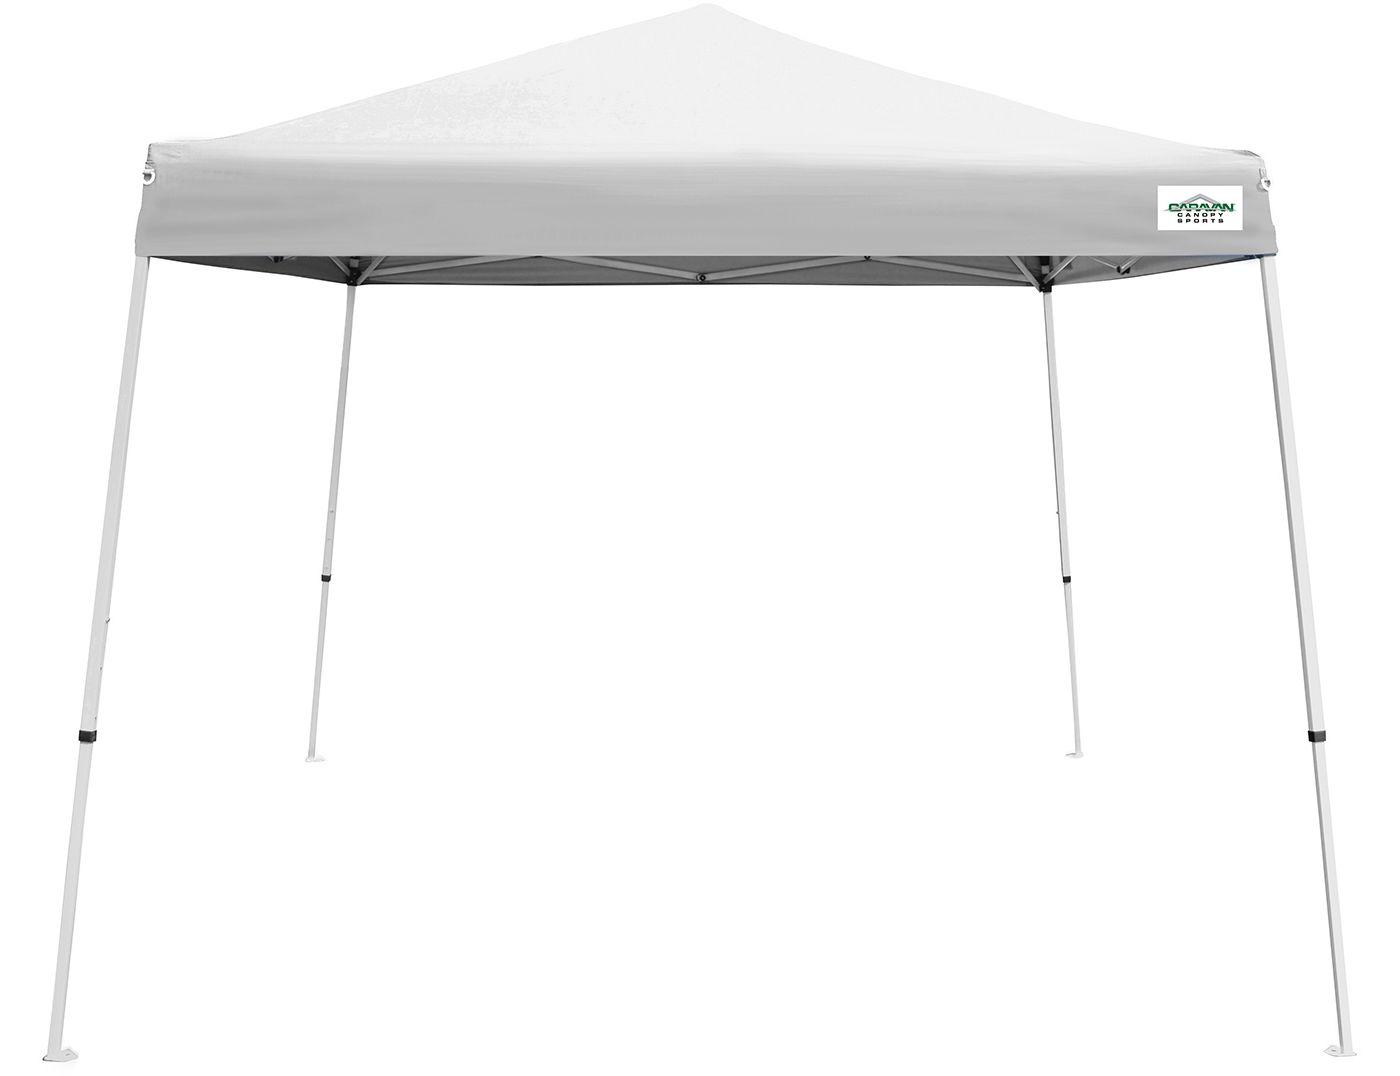 Caravan Canopy V-Series 2 10' x 10' Slant Leg Canopy